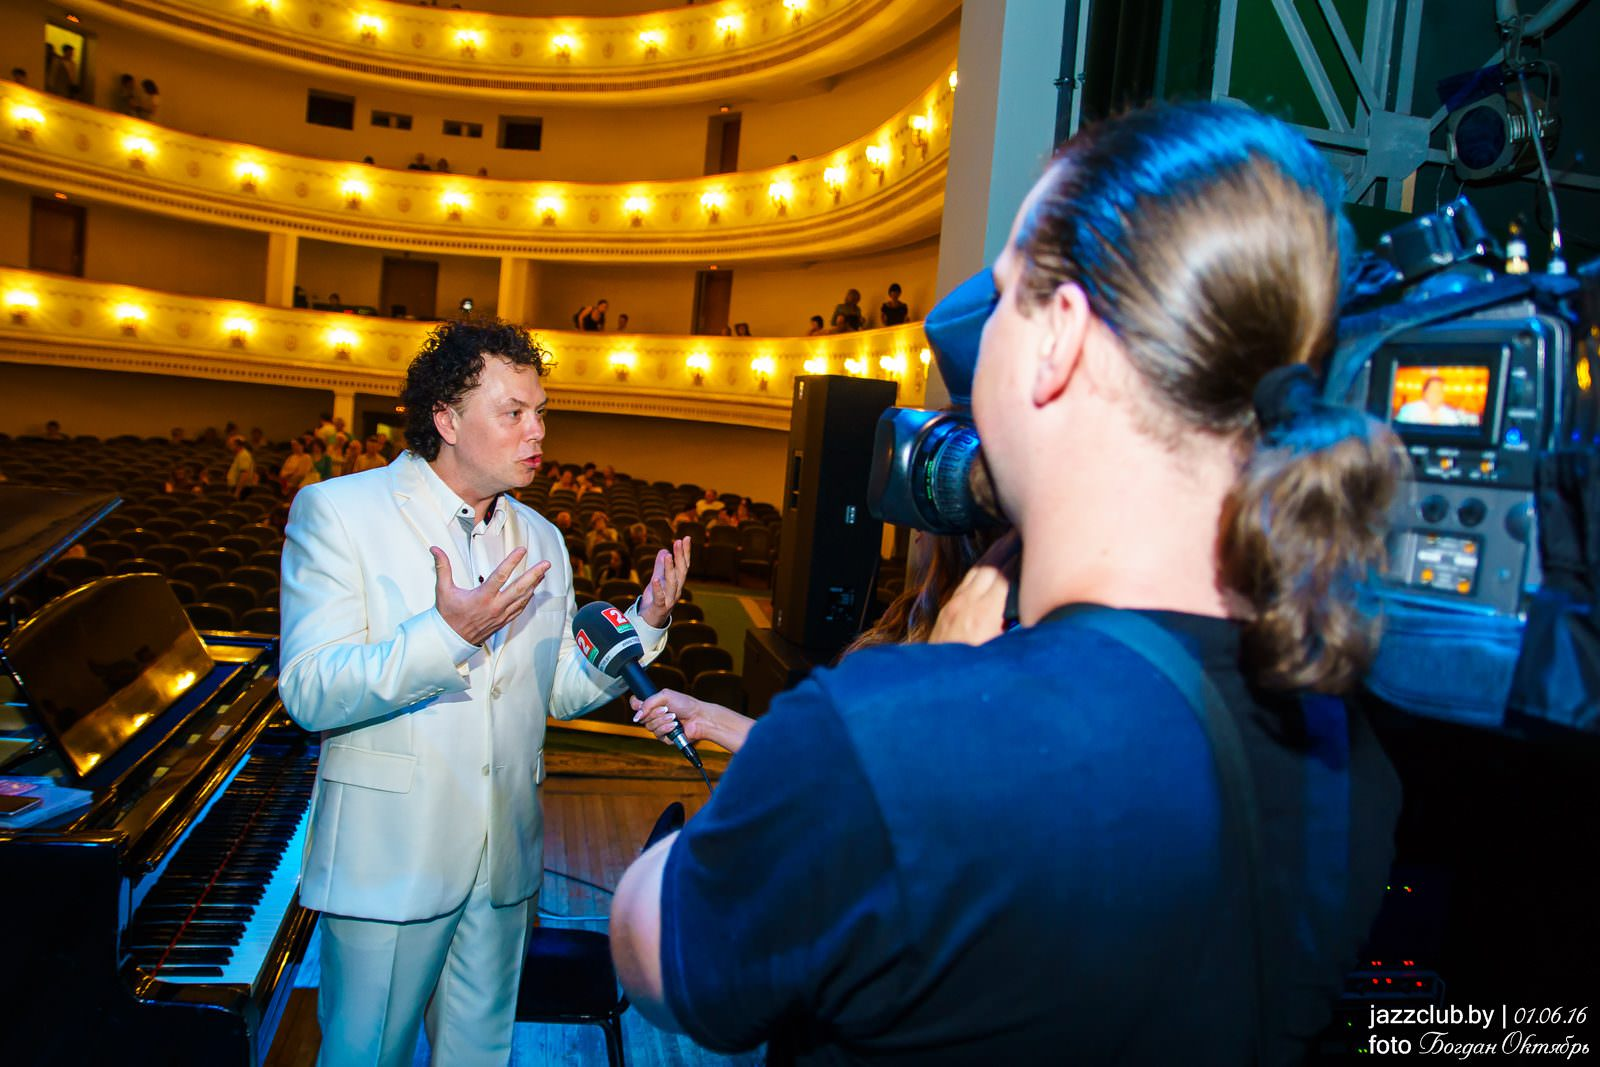 ДЖАЗ в МИНСКЕ: Евгений Владимиров на фестивале JAZZinMinsk-2016 во Дворце Профсоюзов